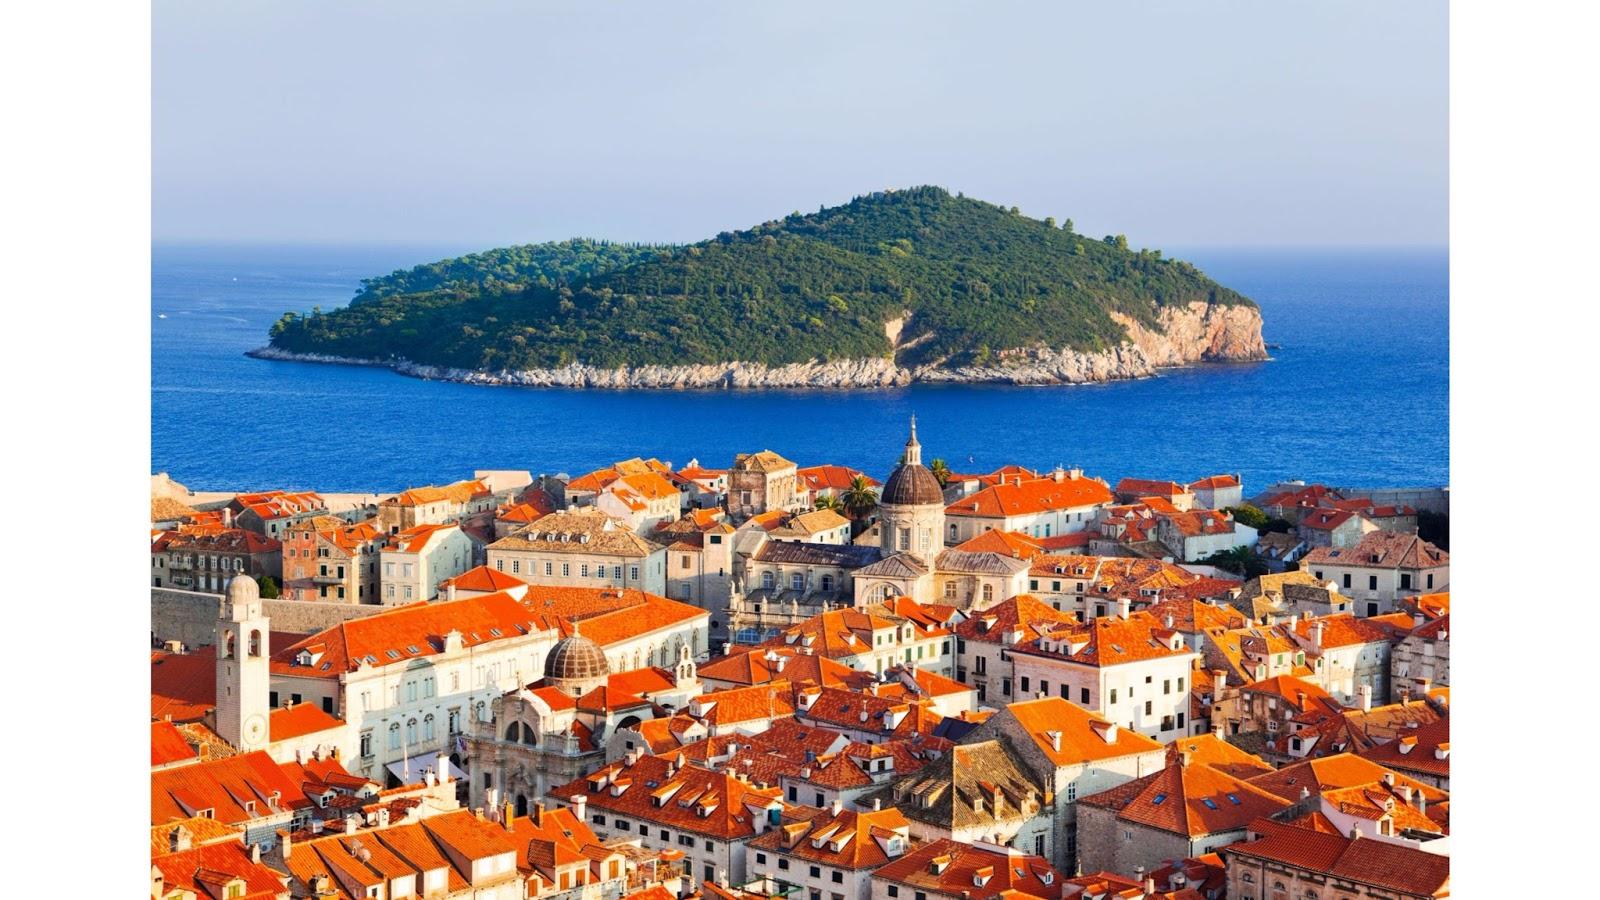 Best-Dubrovnik-Croatia-4K-Wallpaper